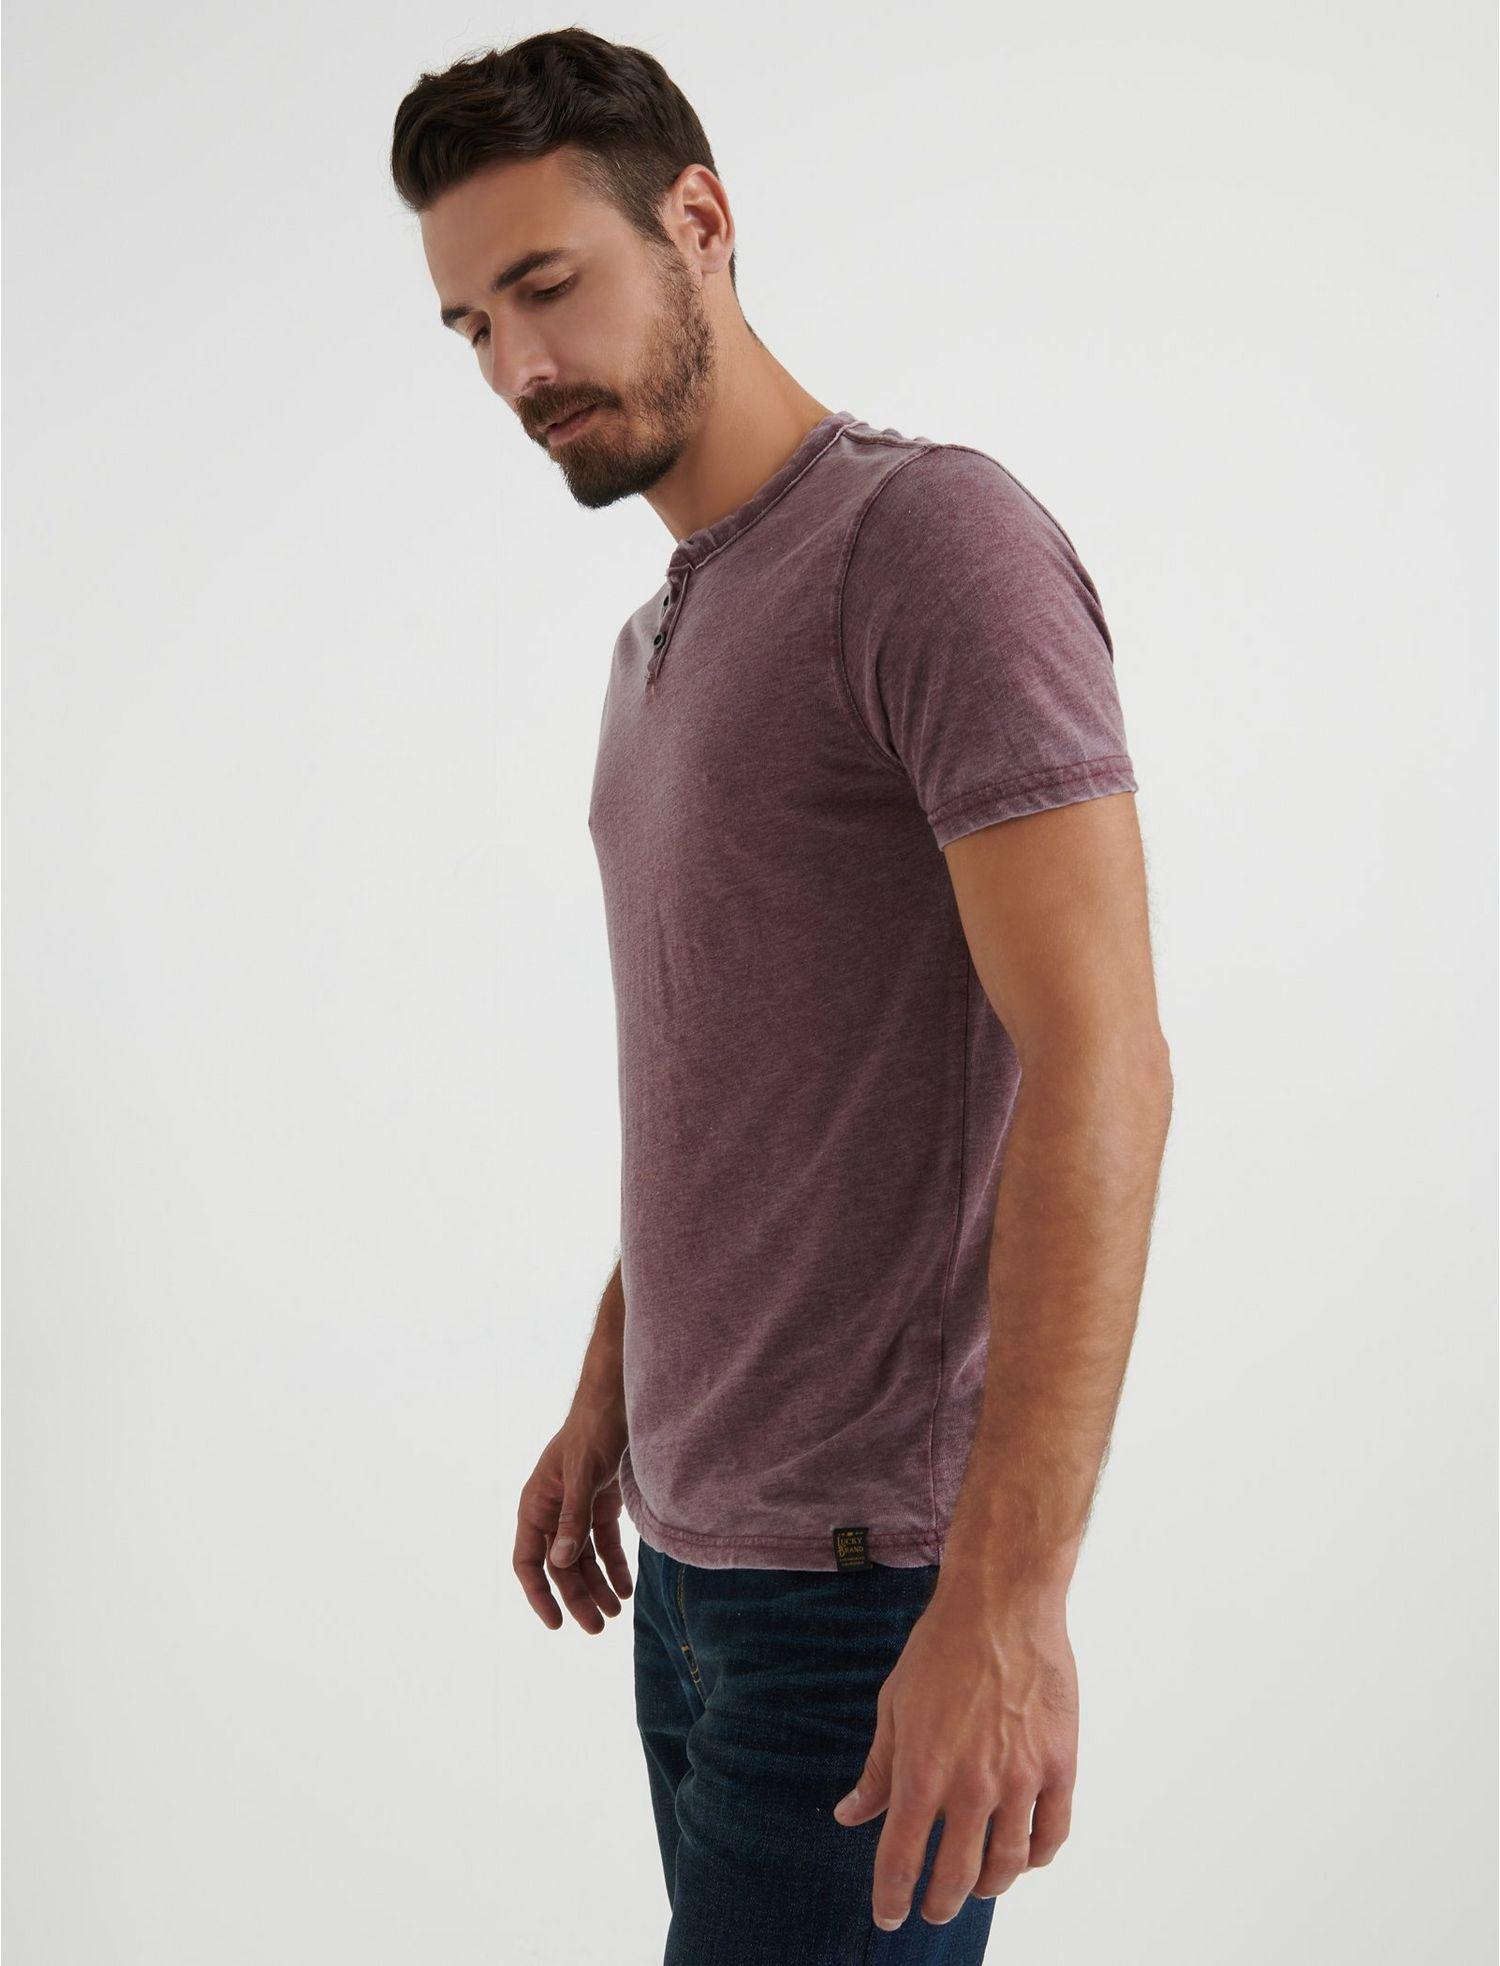 Lucky Brand Mens Venice Burnout Notch Ringer Long Sleeve Shirt Port Royale Purple Red